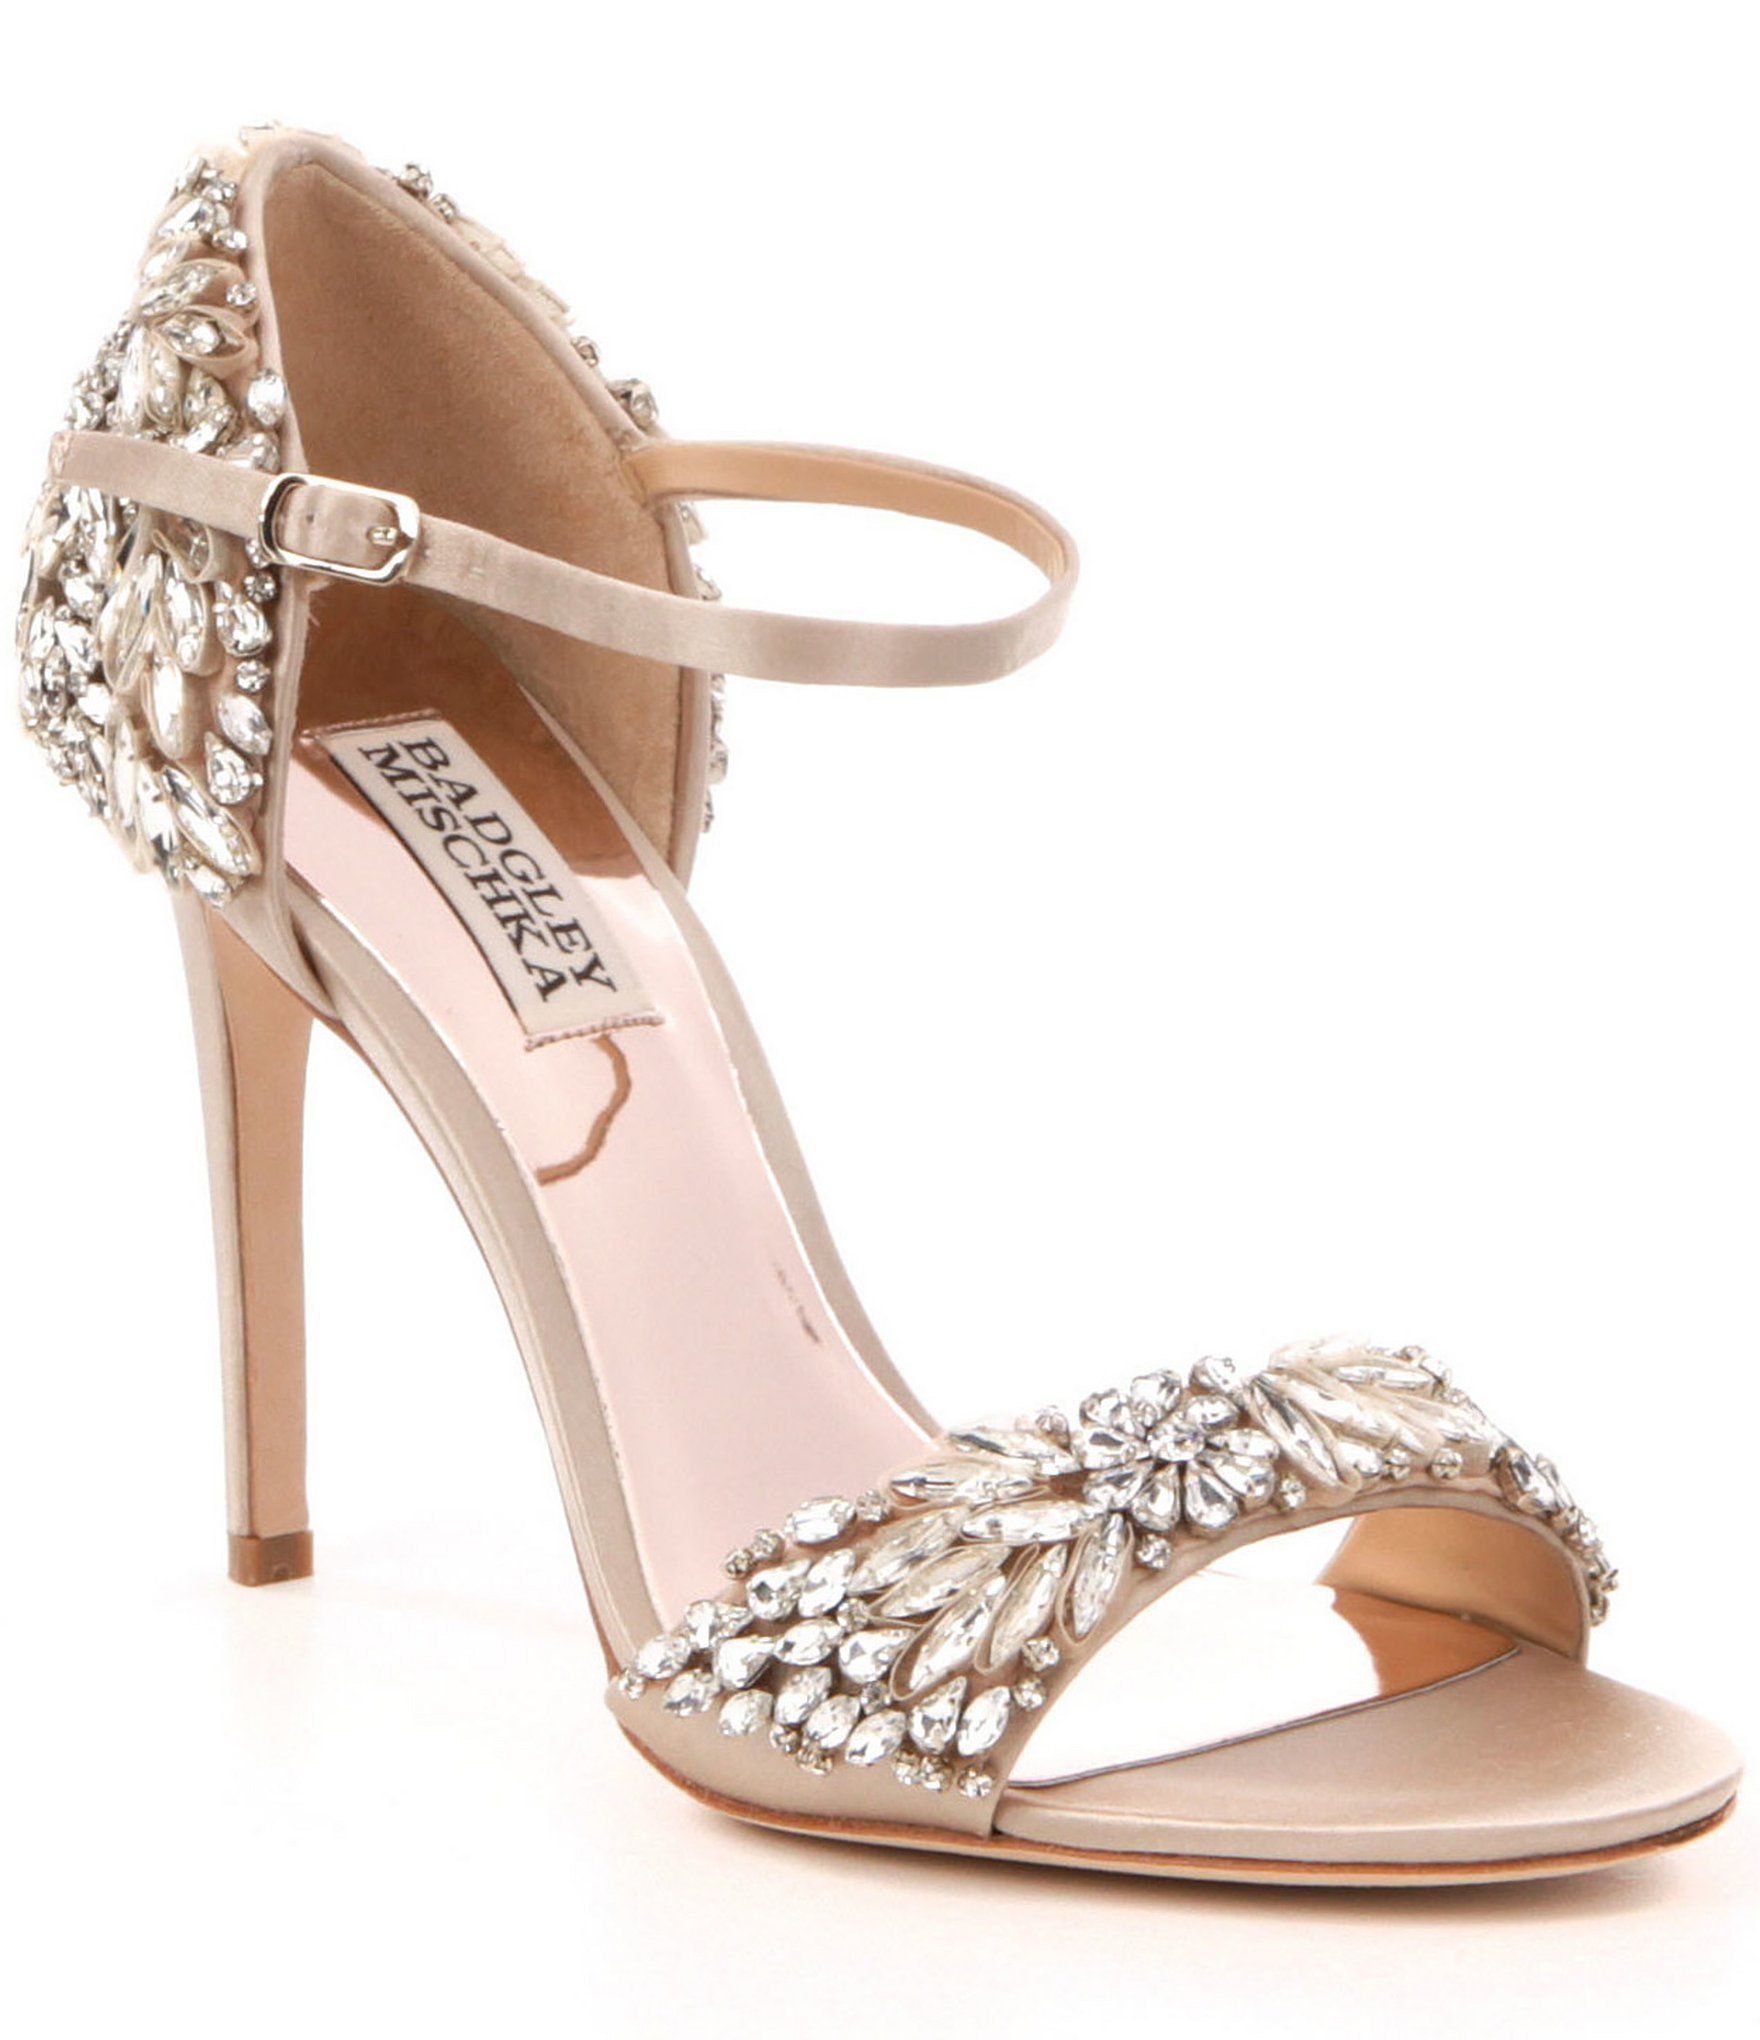 Badgley Mischka Tampa Jeweled Satin Dress Sandals Manolo Blahnik